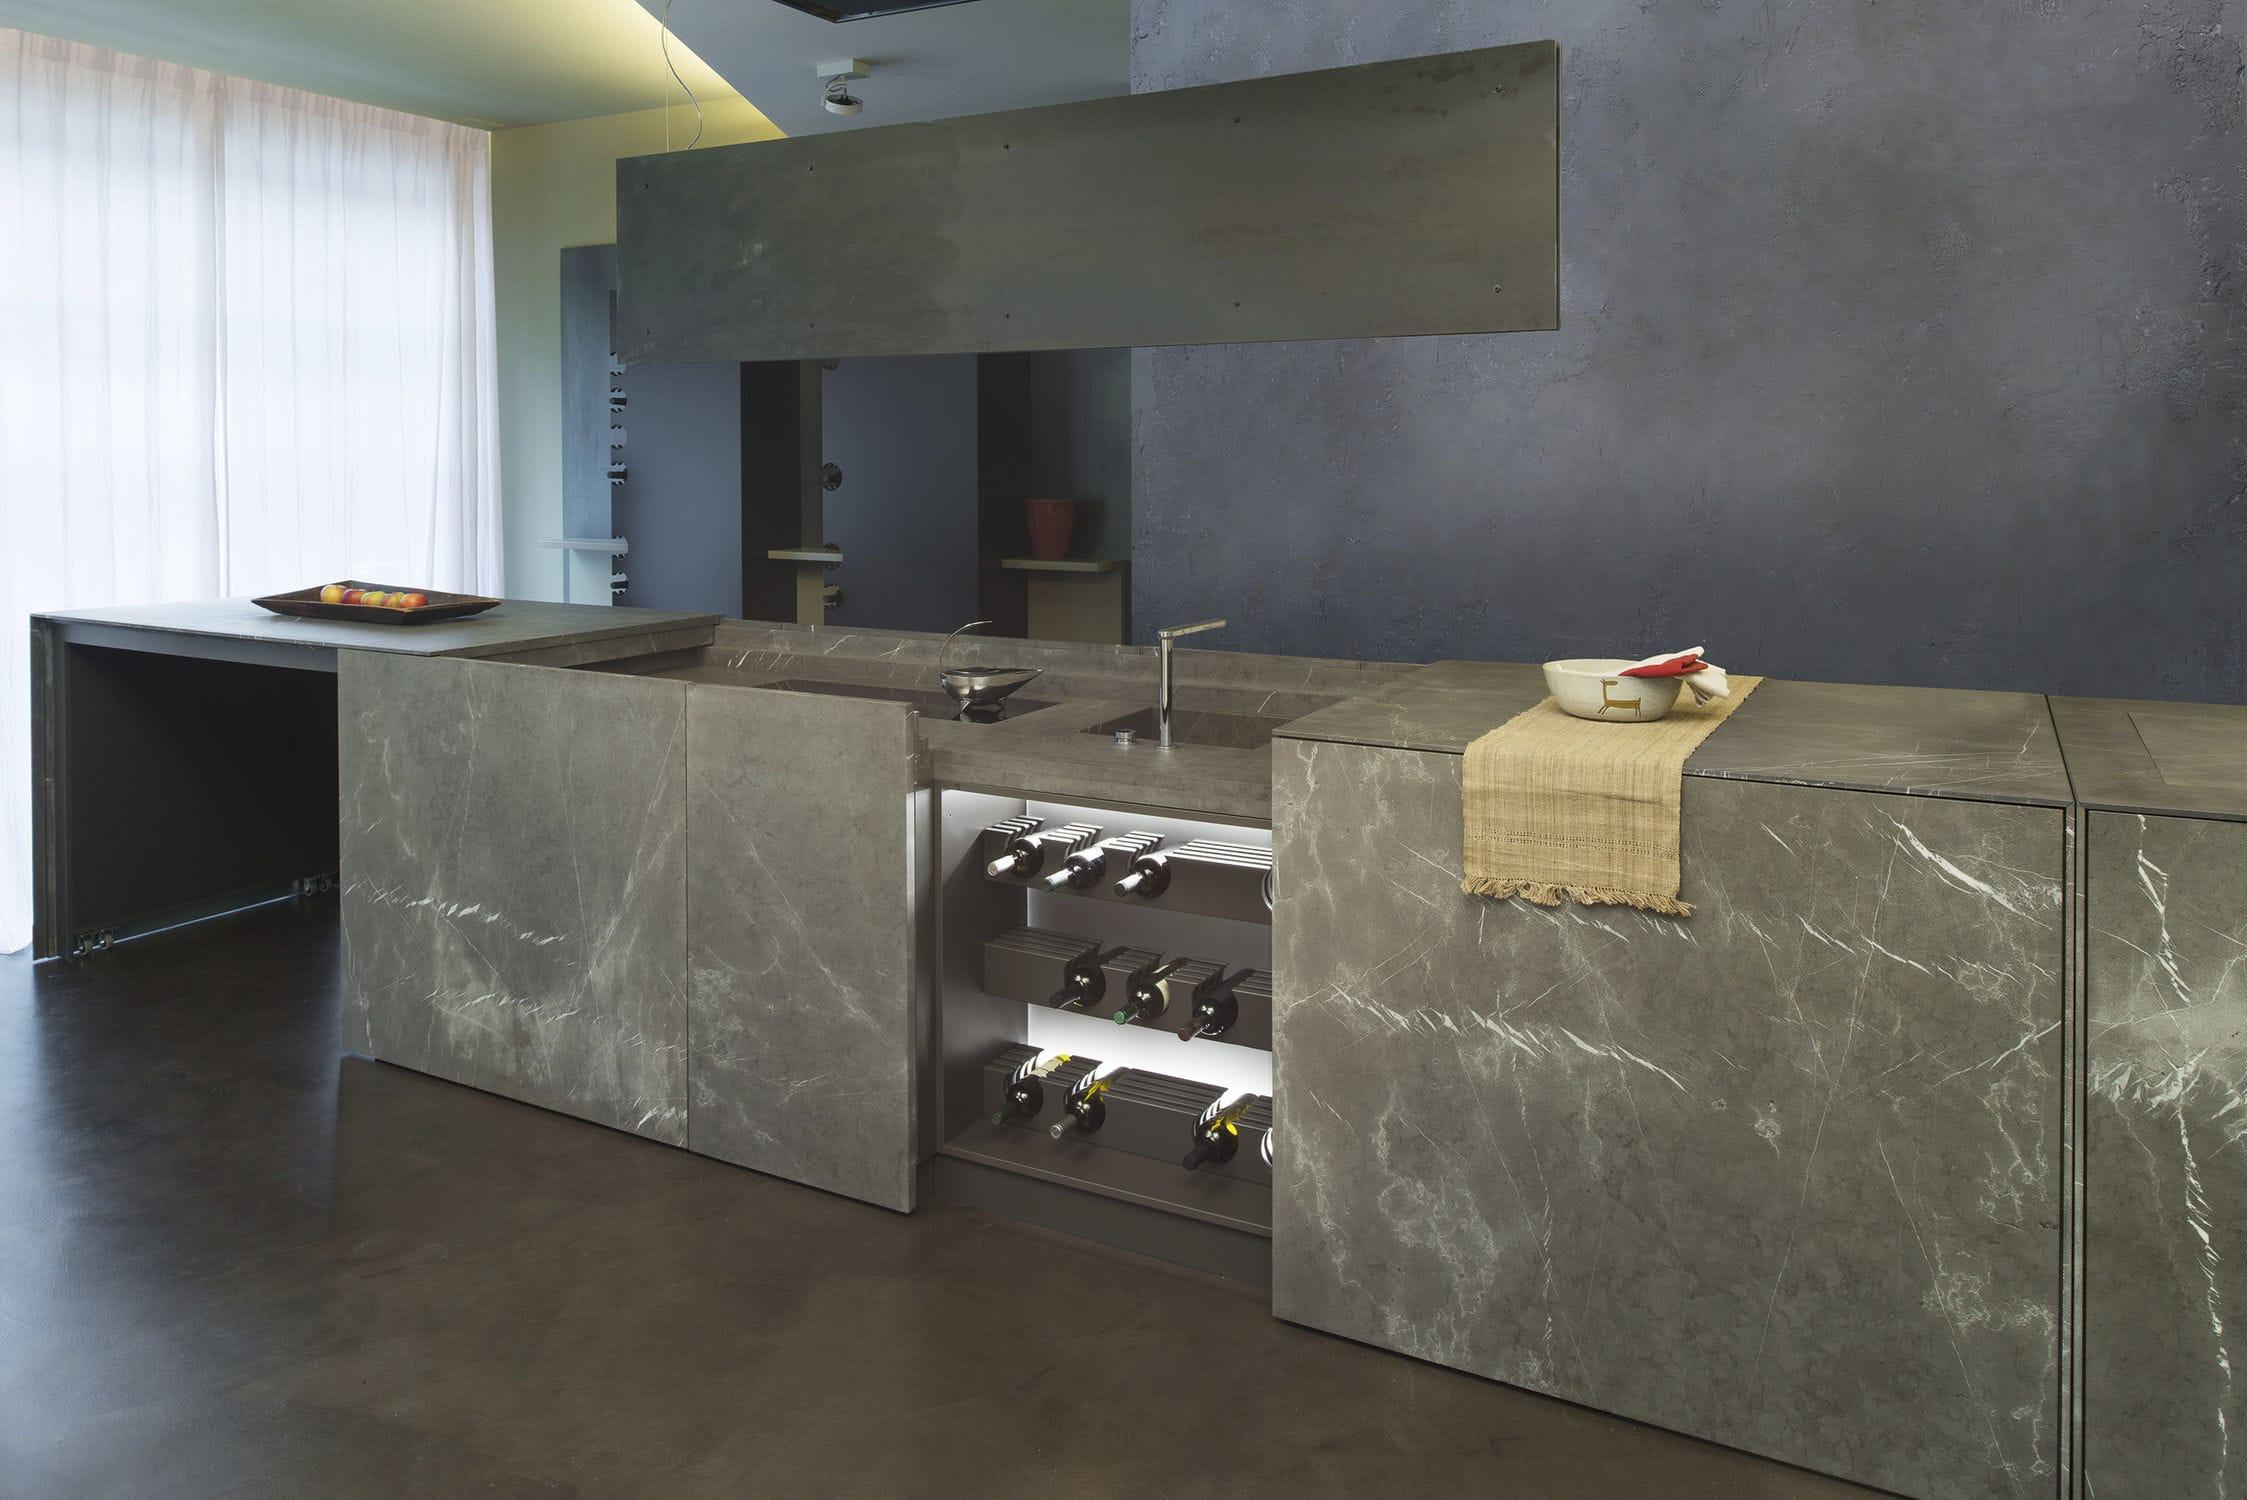 Cocina moderna / de piedra / con isla - 20141002 – CUCINA MONOBLOCCO ...